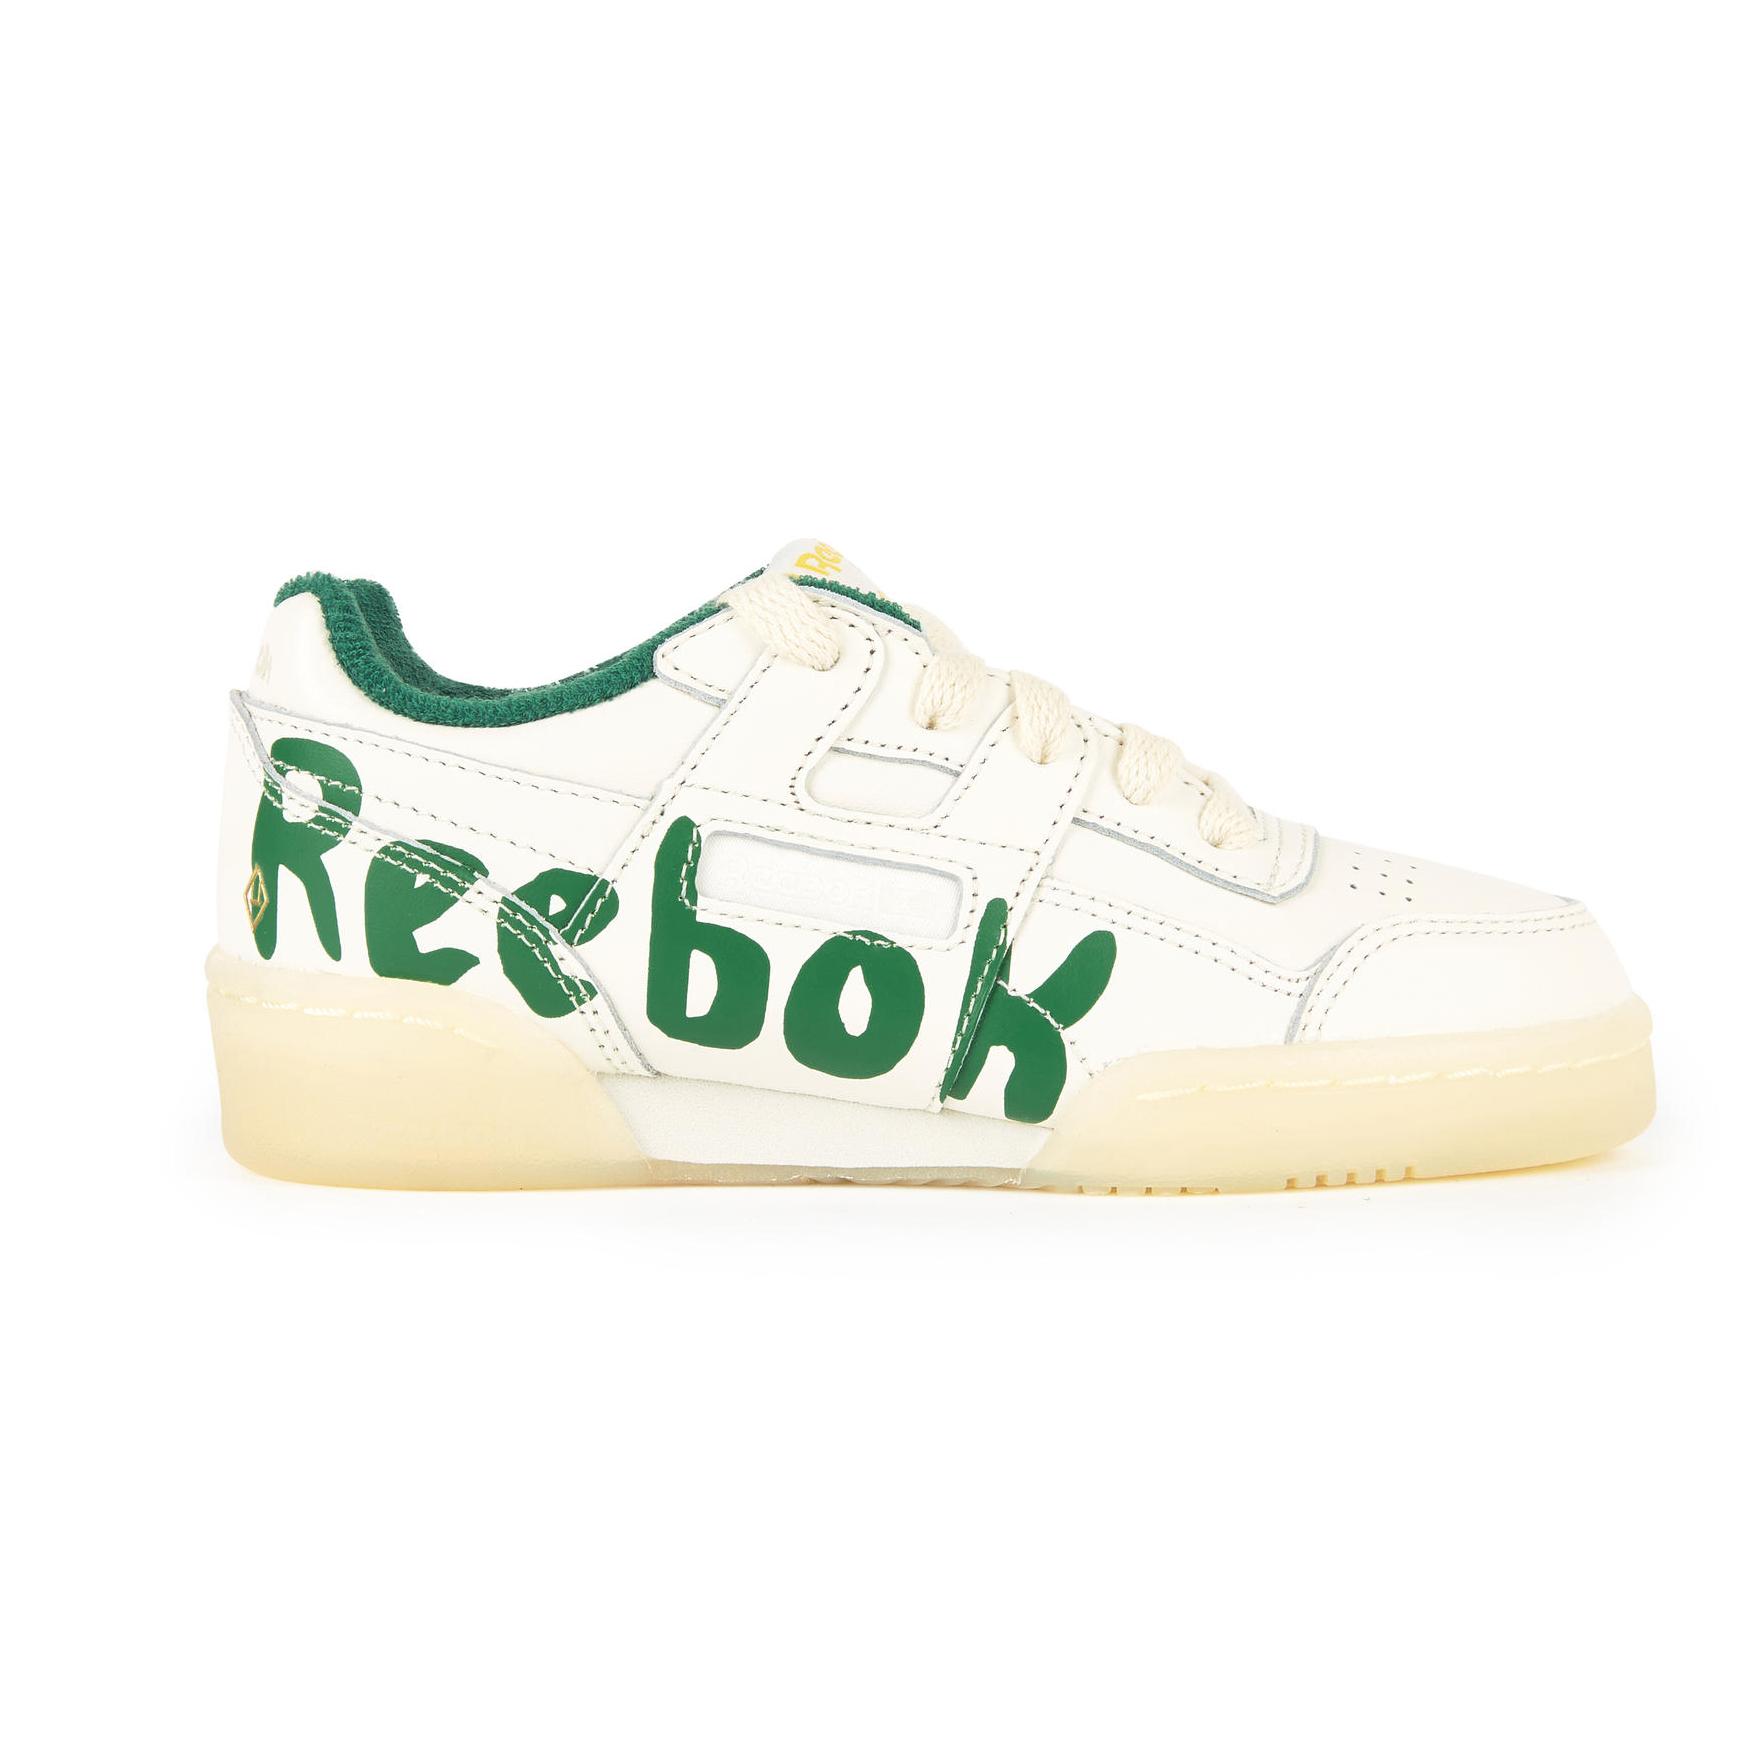 Reebok x The Animal Observatory Sneakers